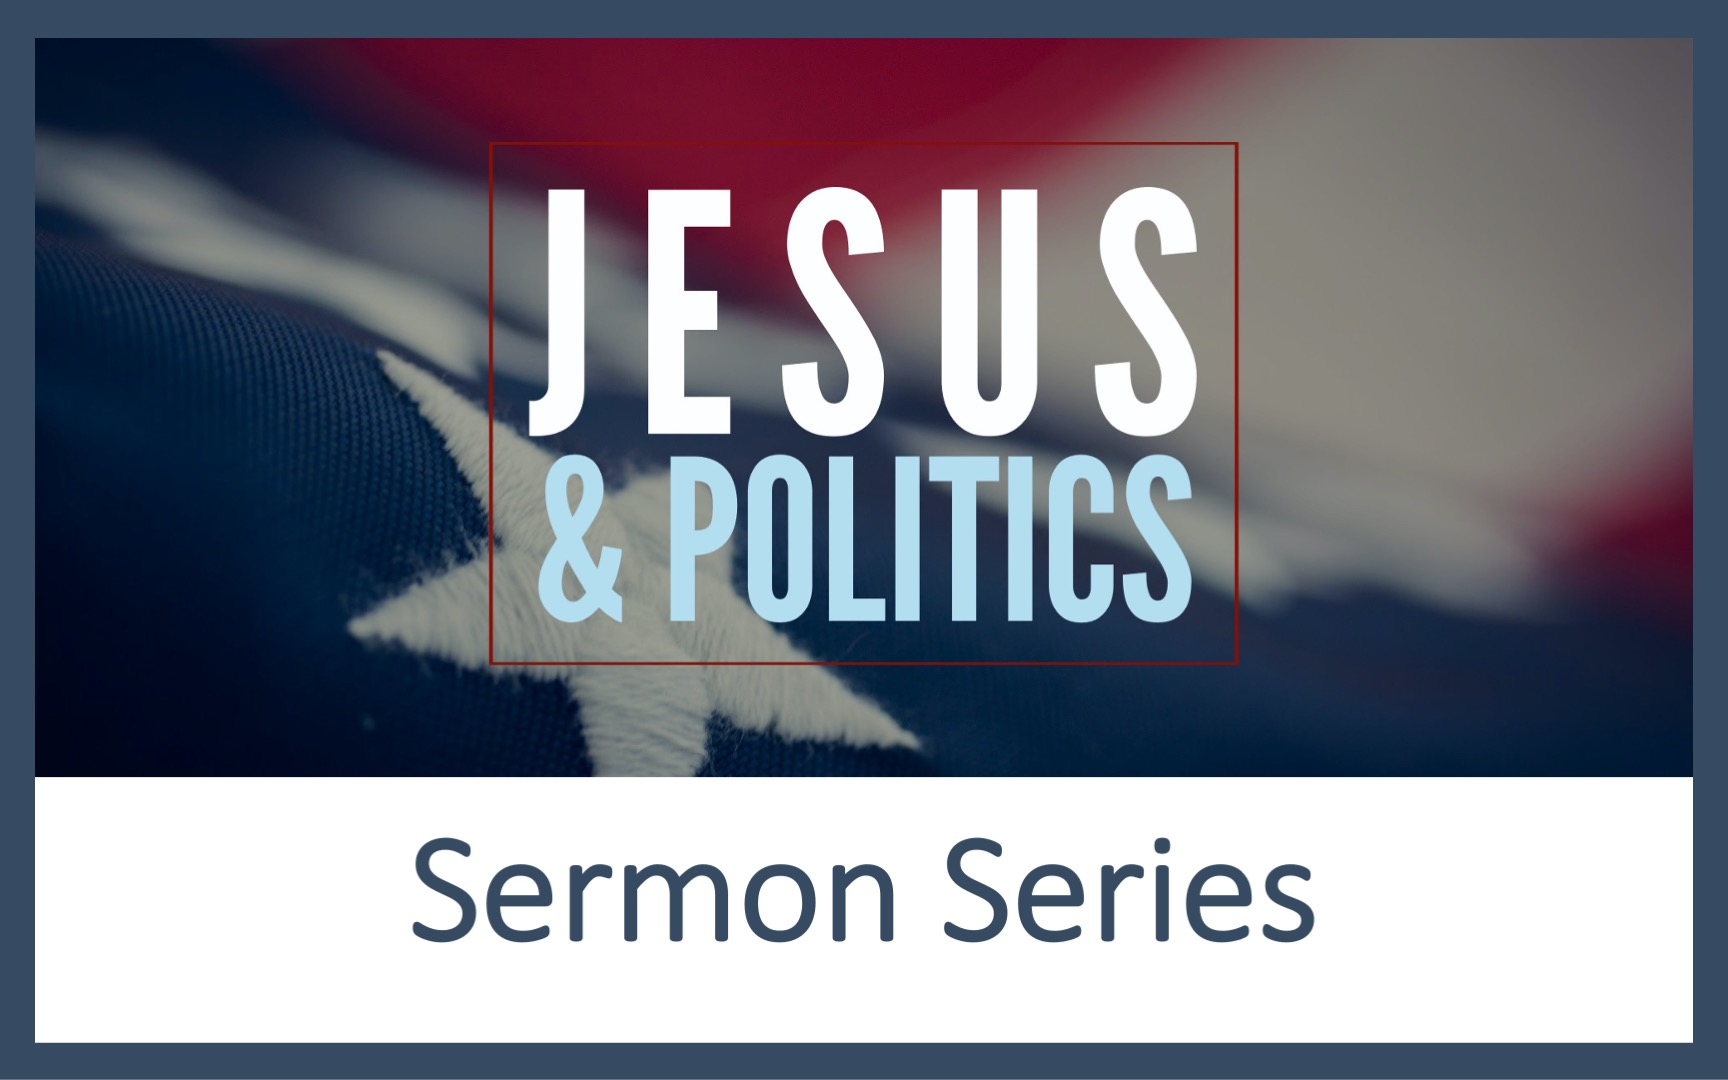 jesus&politics-sermonseries